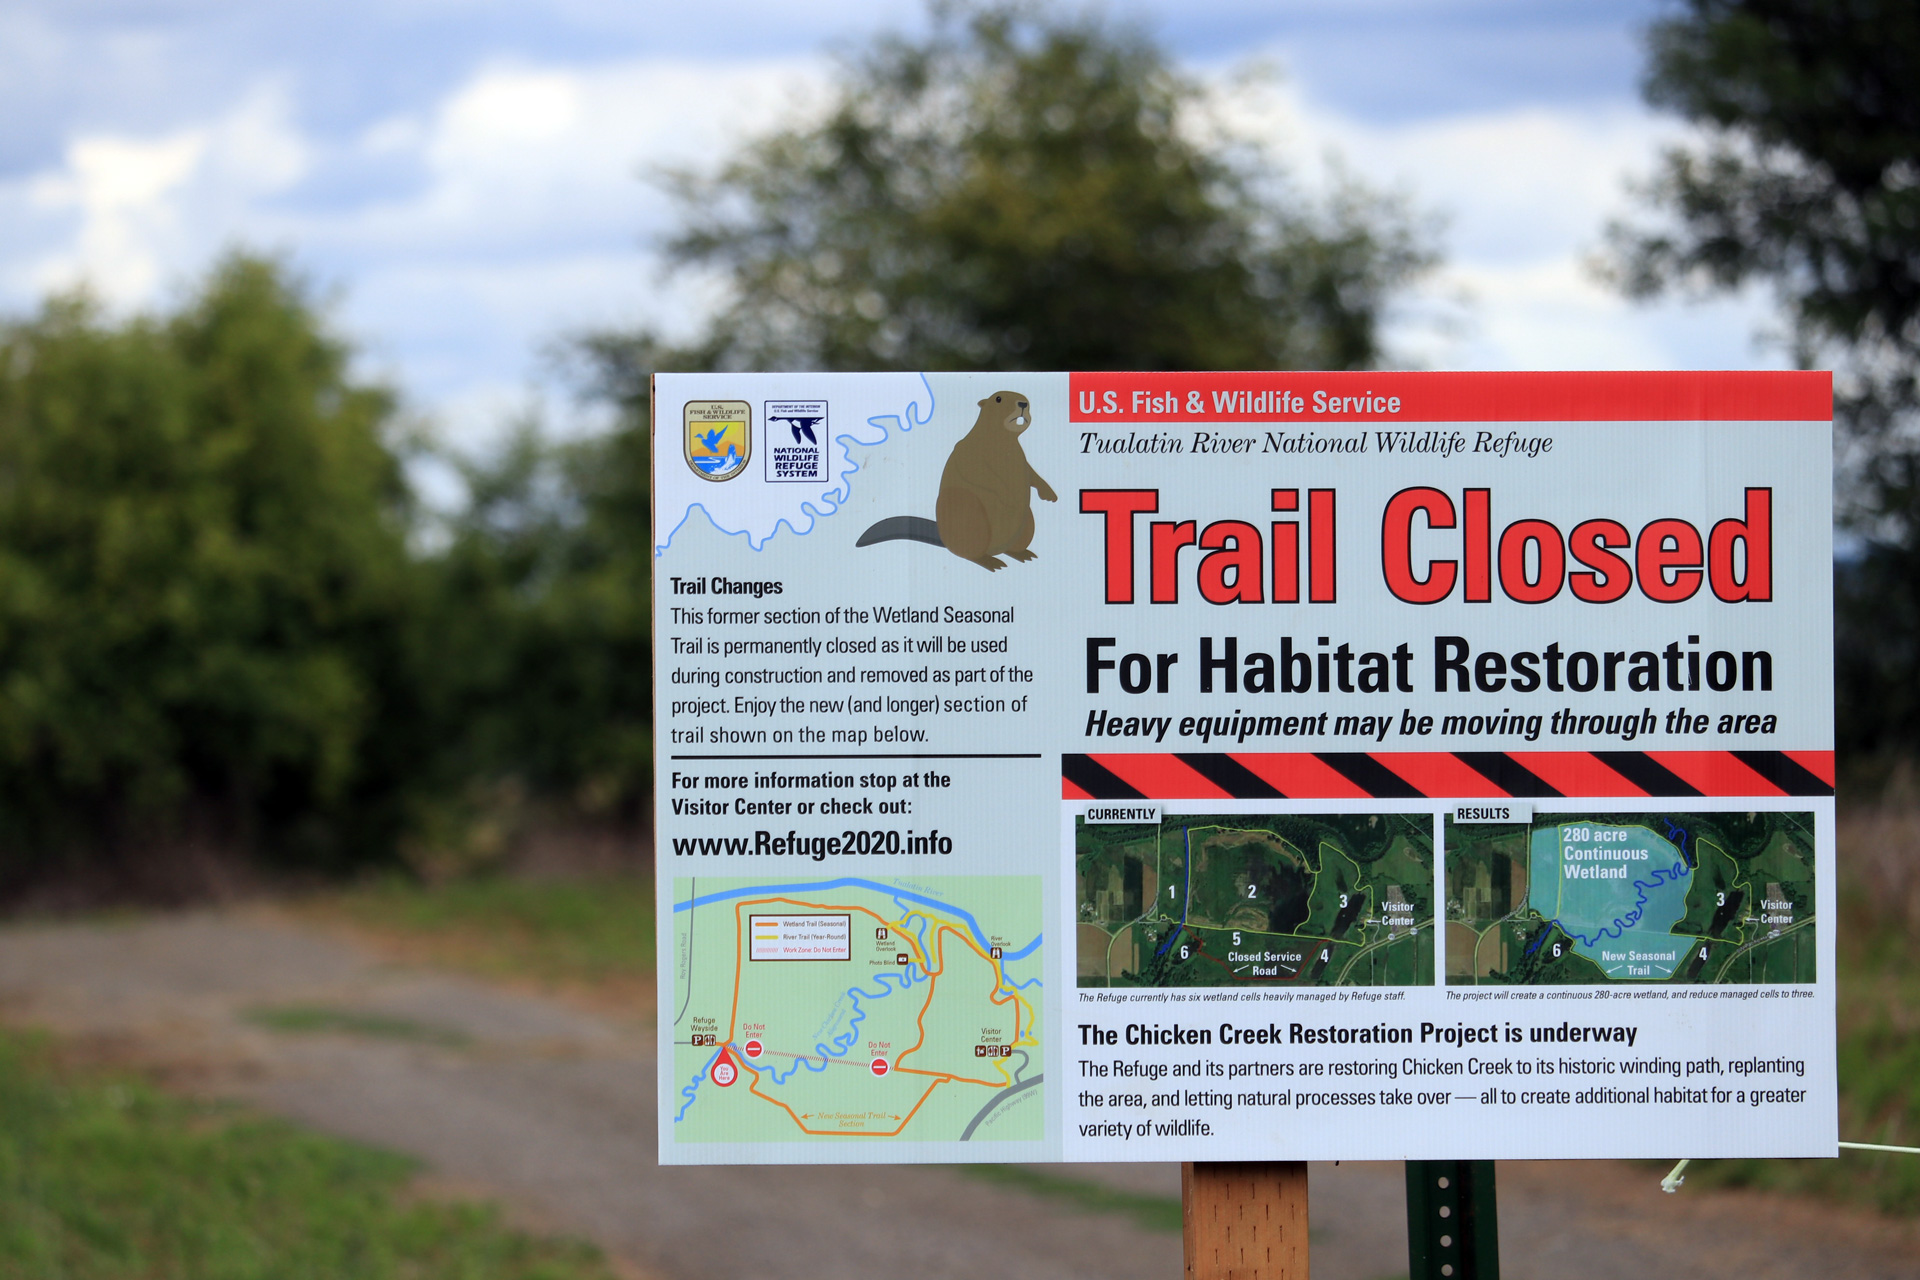 Trail-Closed-Sign-1.jpg